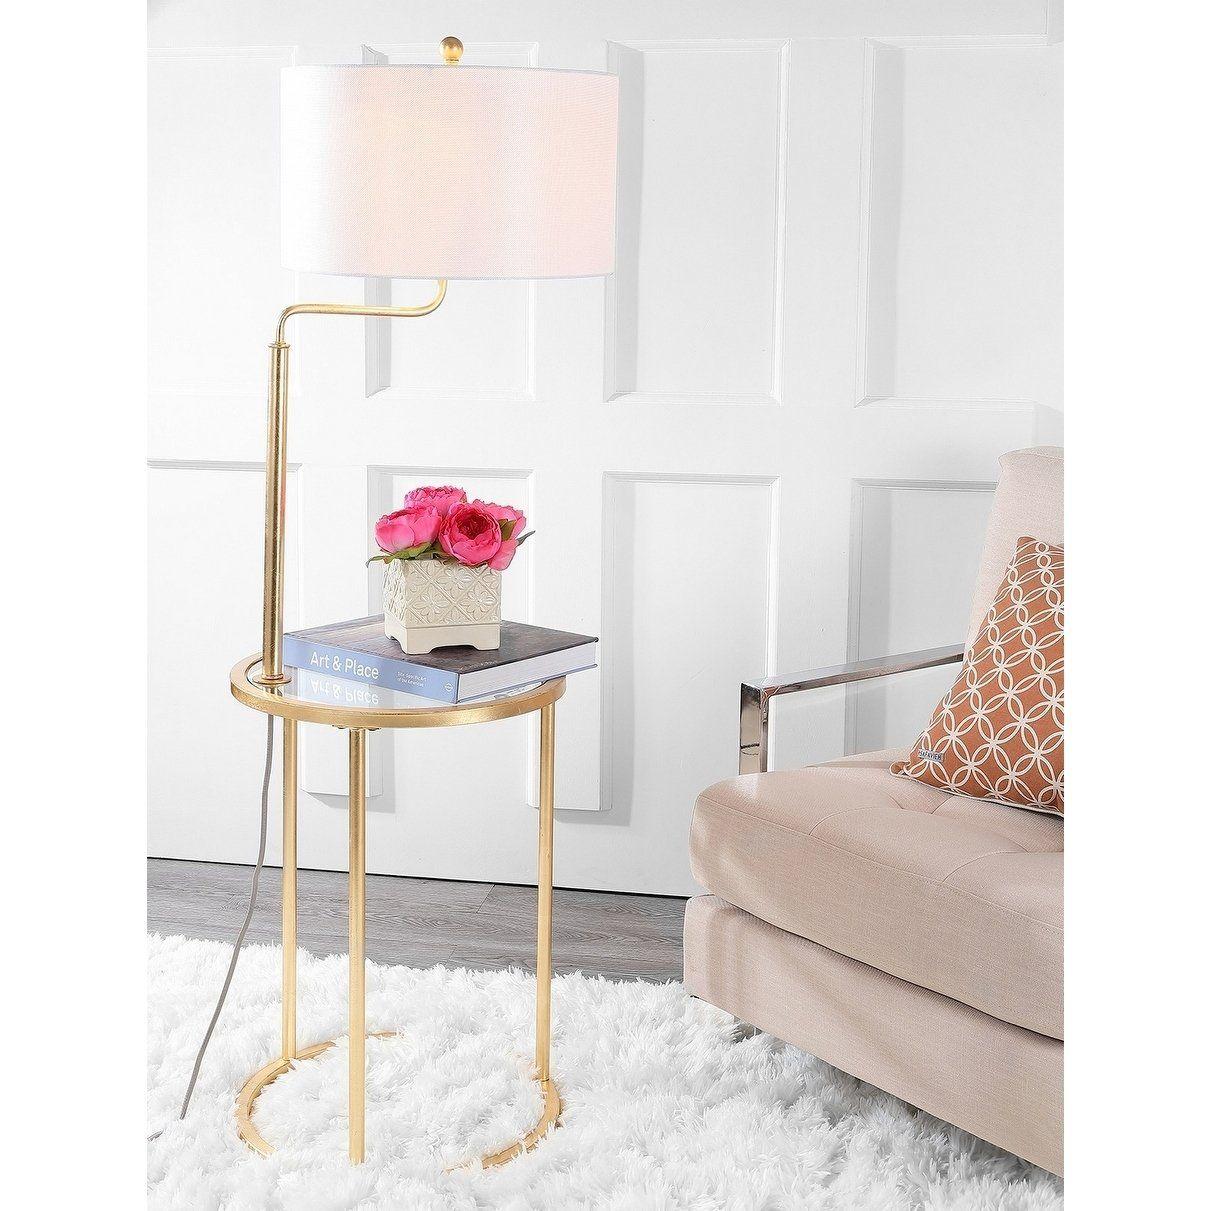 Safavieh Lighting 57inch Crispin Gold Side Table LED